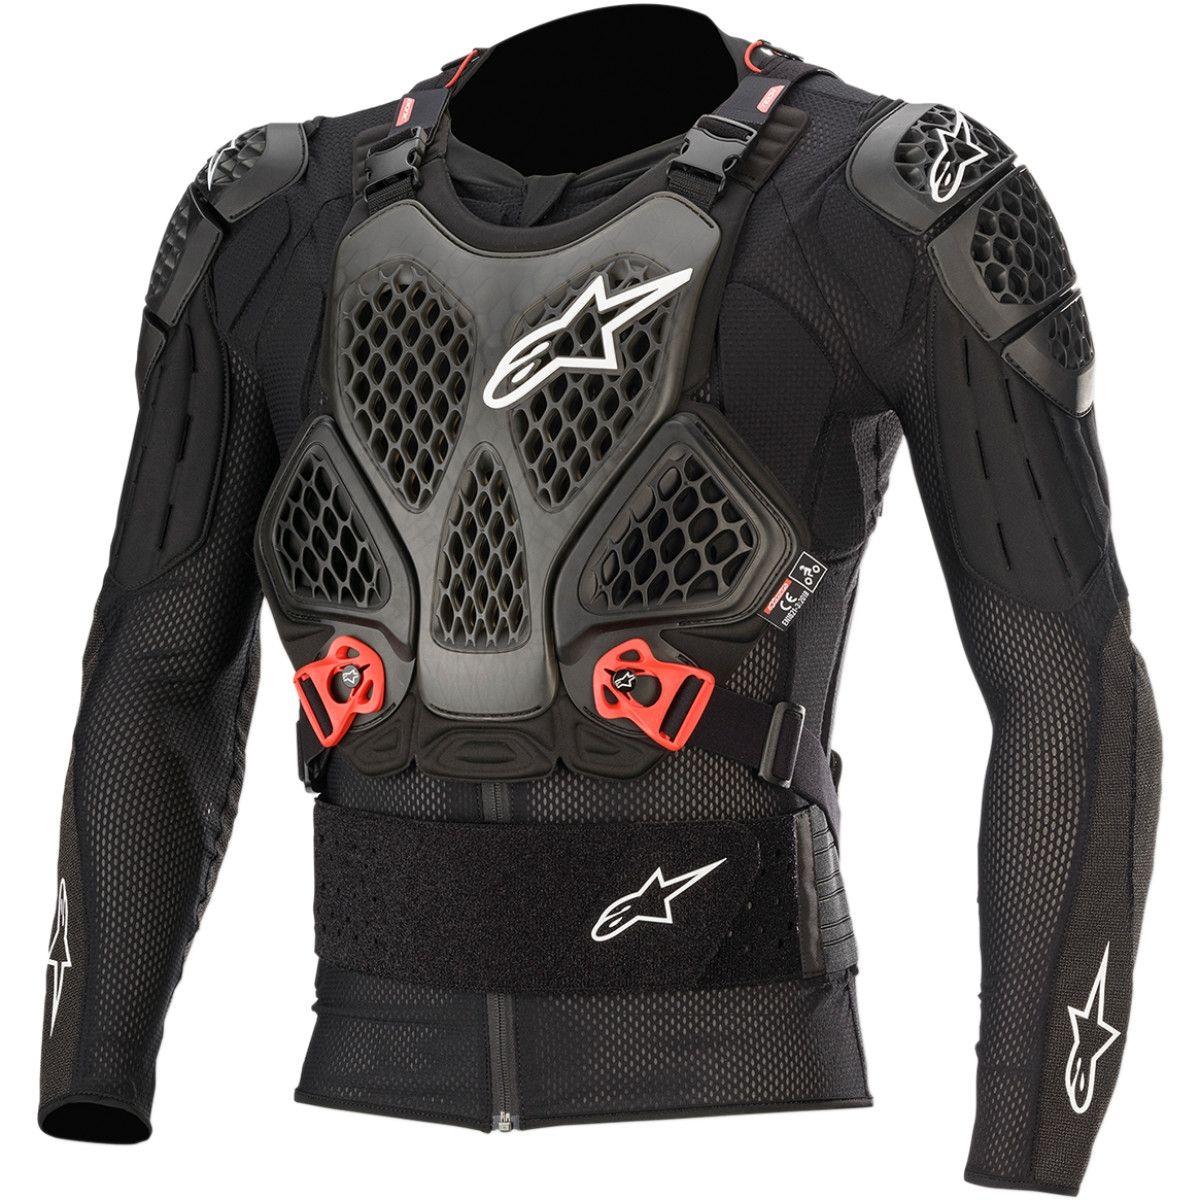 Alpinestars Bionic Tech V2 Protectievest Black/Red